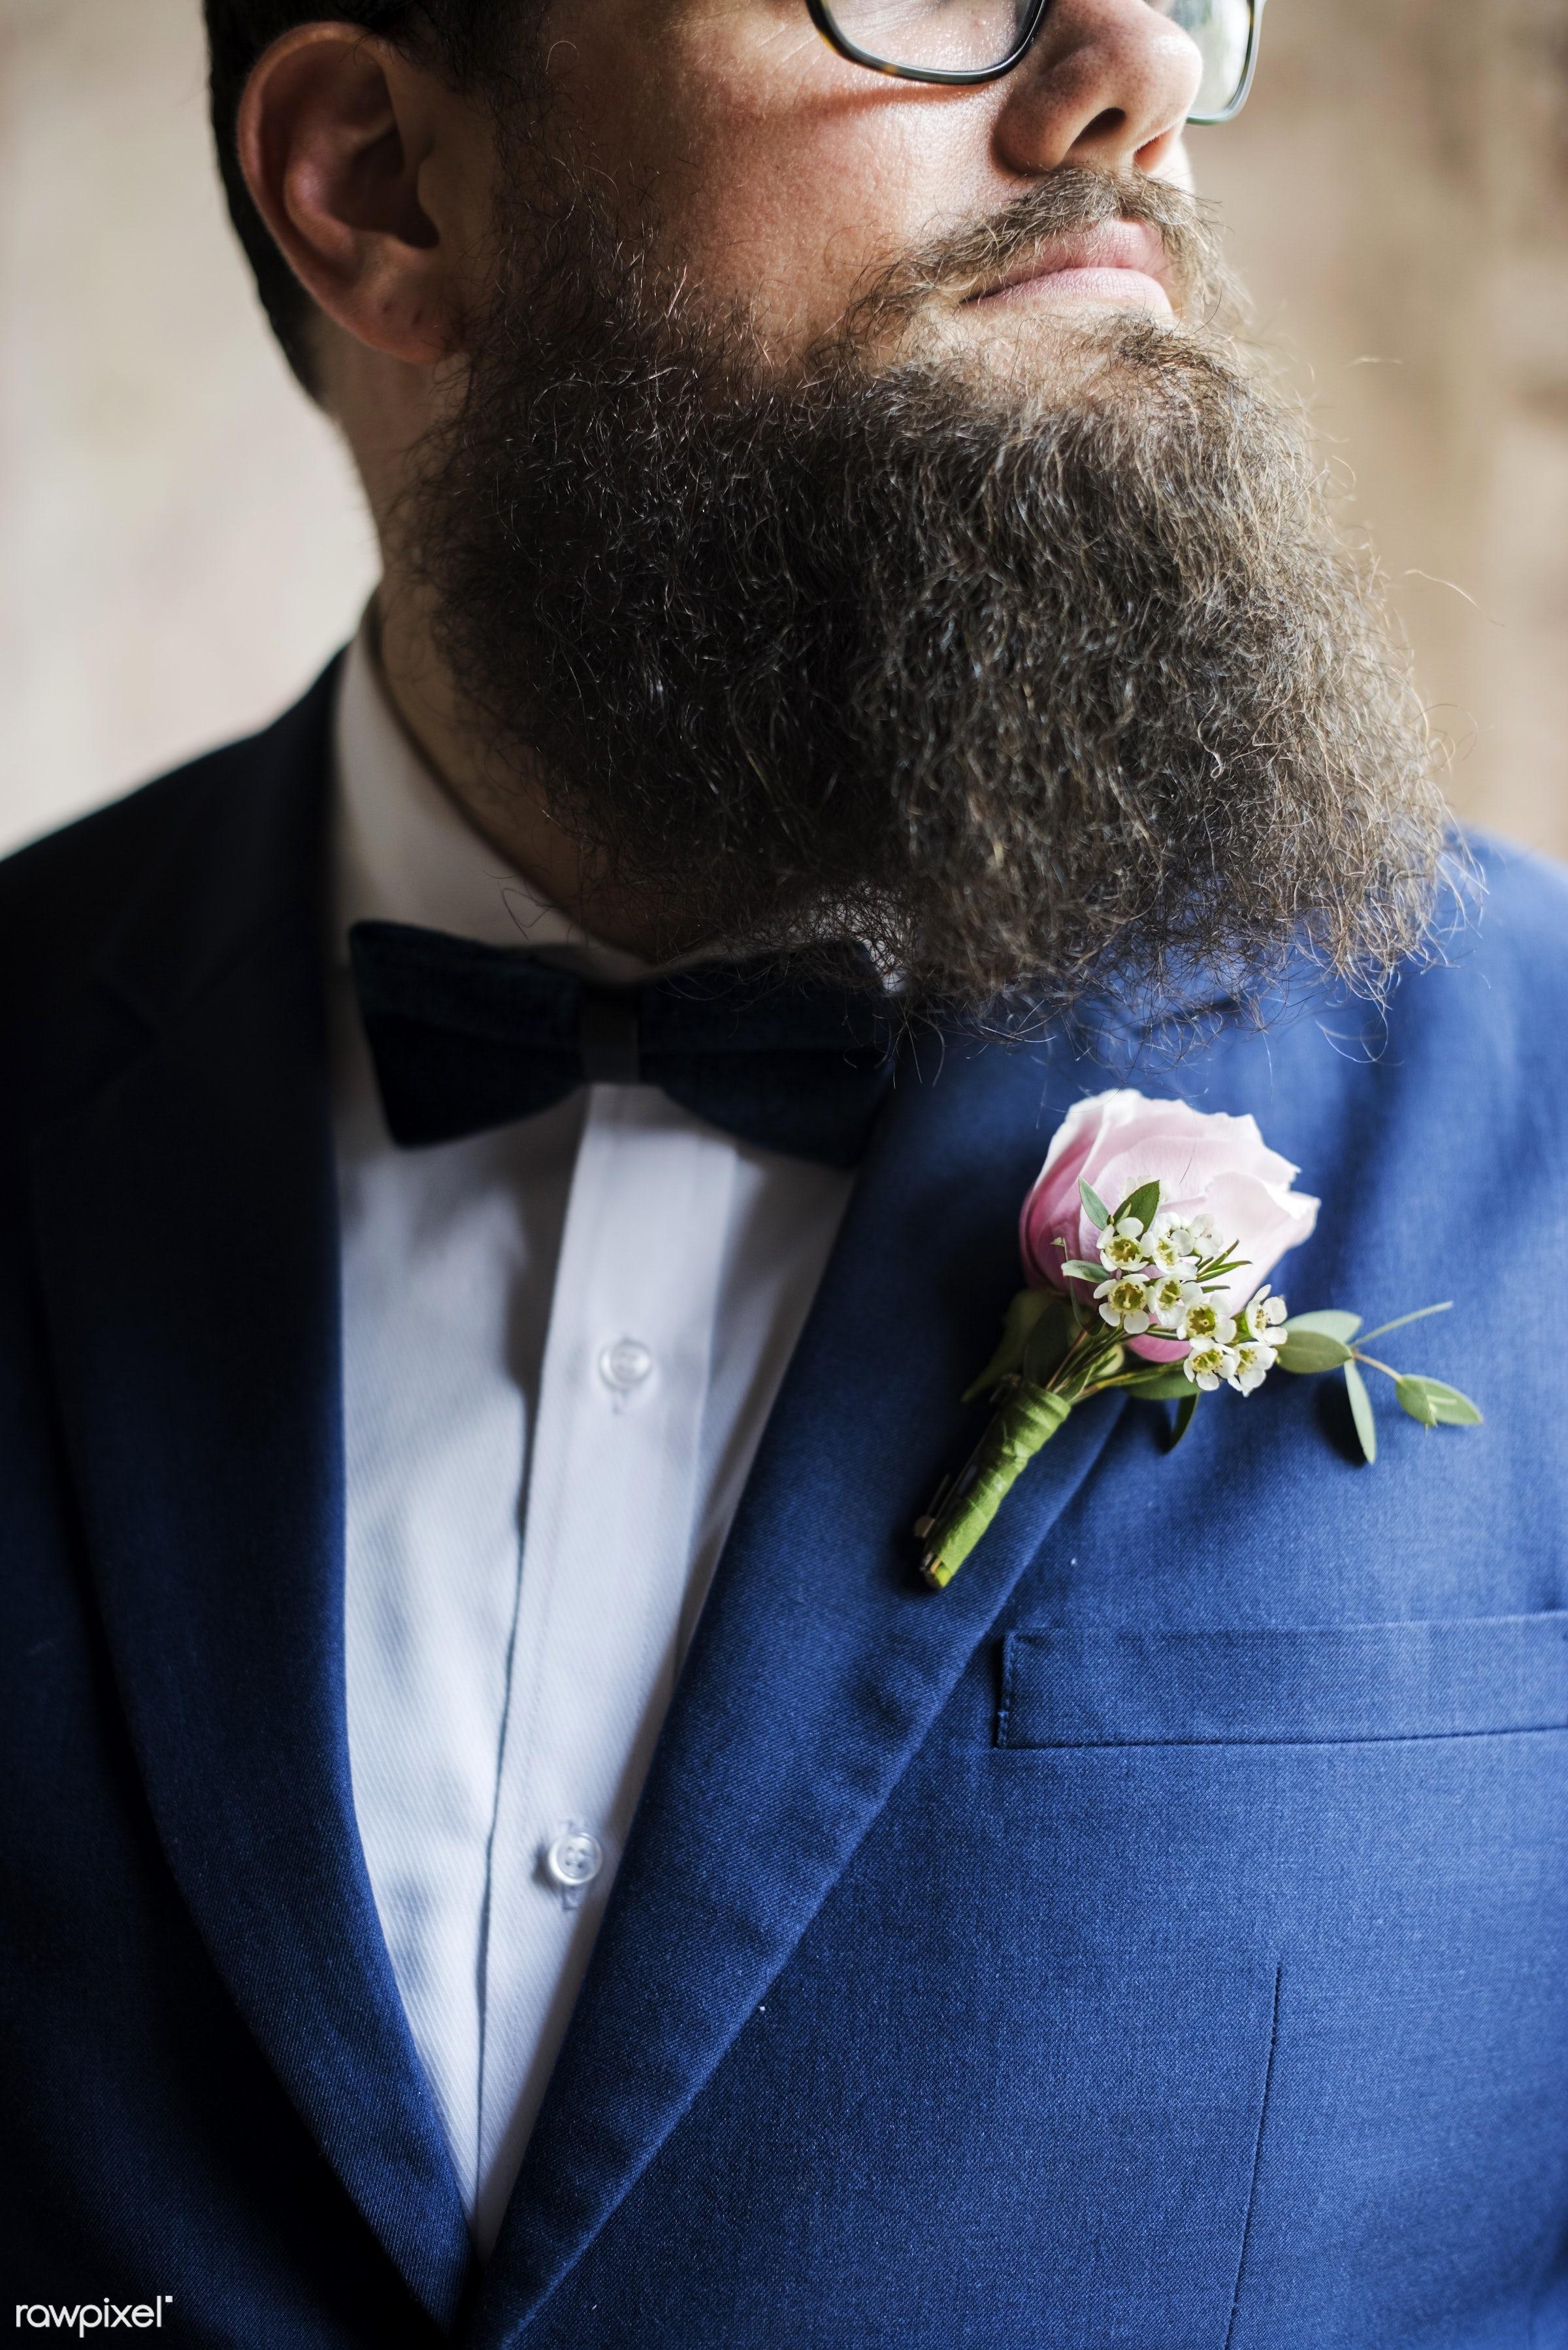 bouquet, person, husband, navy blue suit, married, tuxedo, event, couple, cheerful, lapel, closeup, flower, man, preparation...